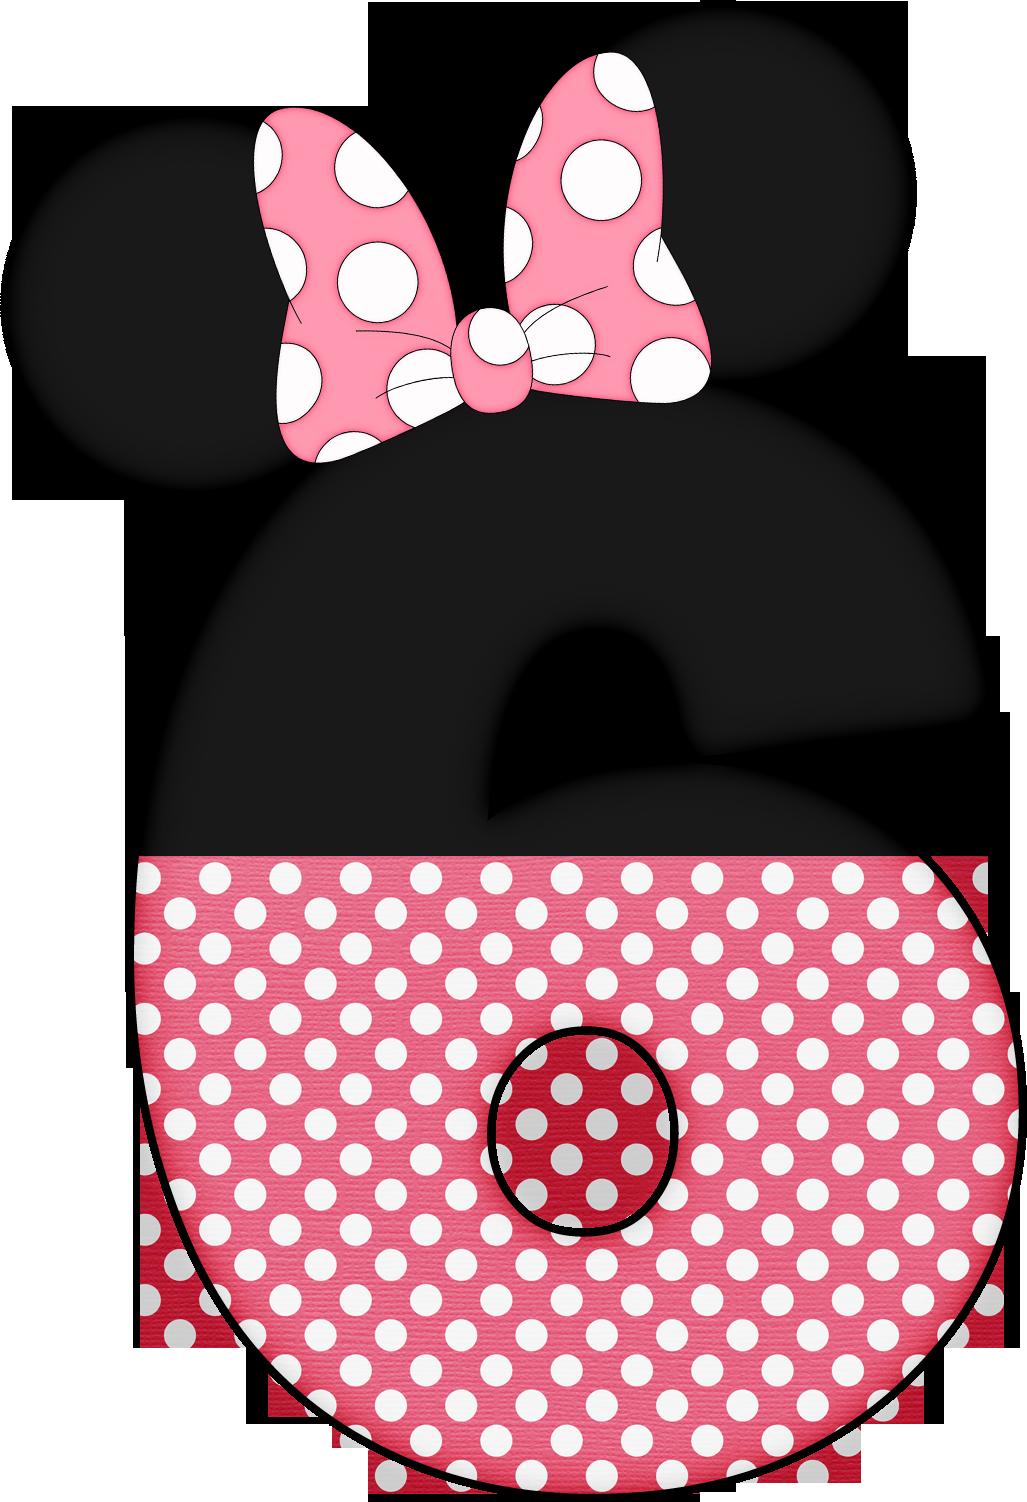 Ibybtrb ya il png. Disneyland clipart letterhead